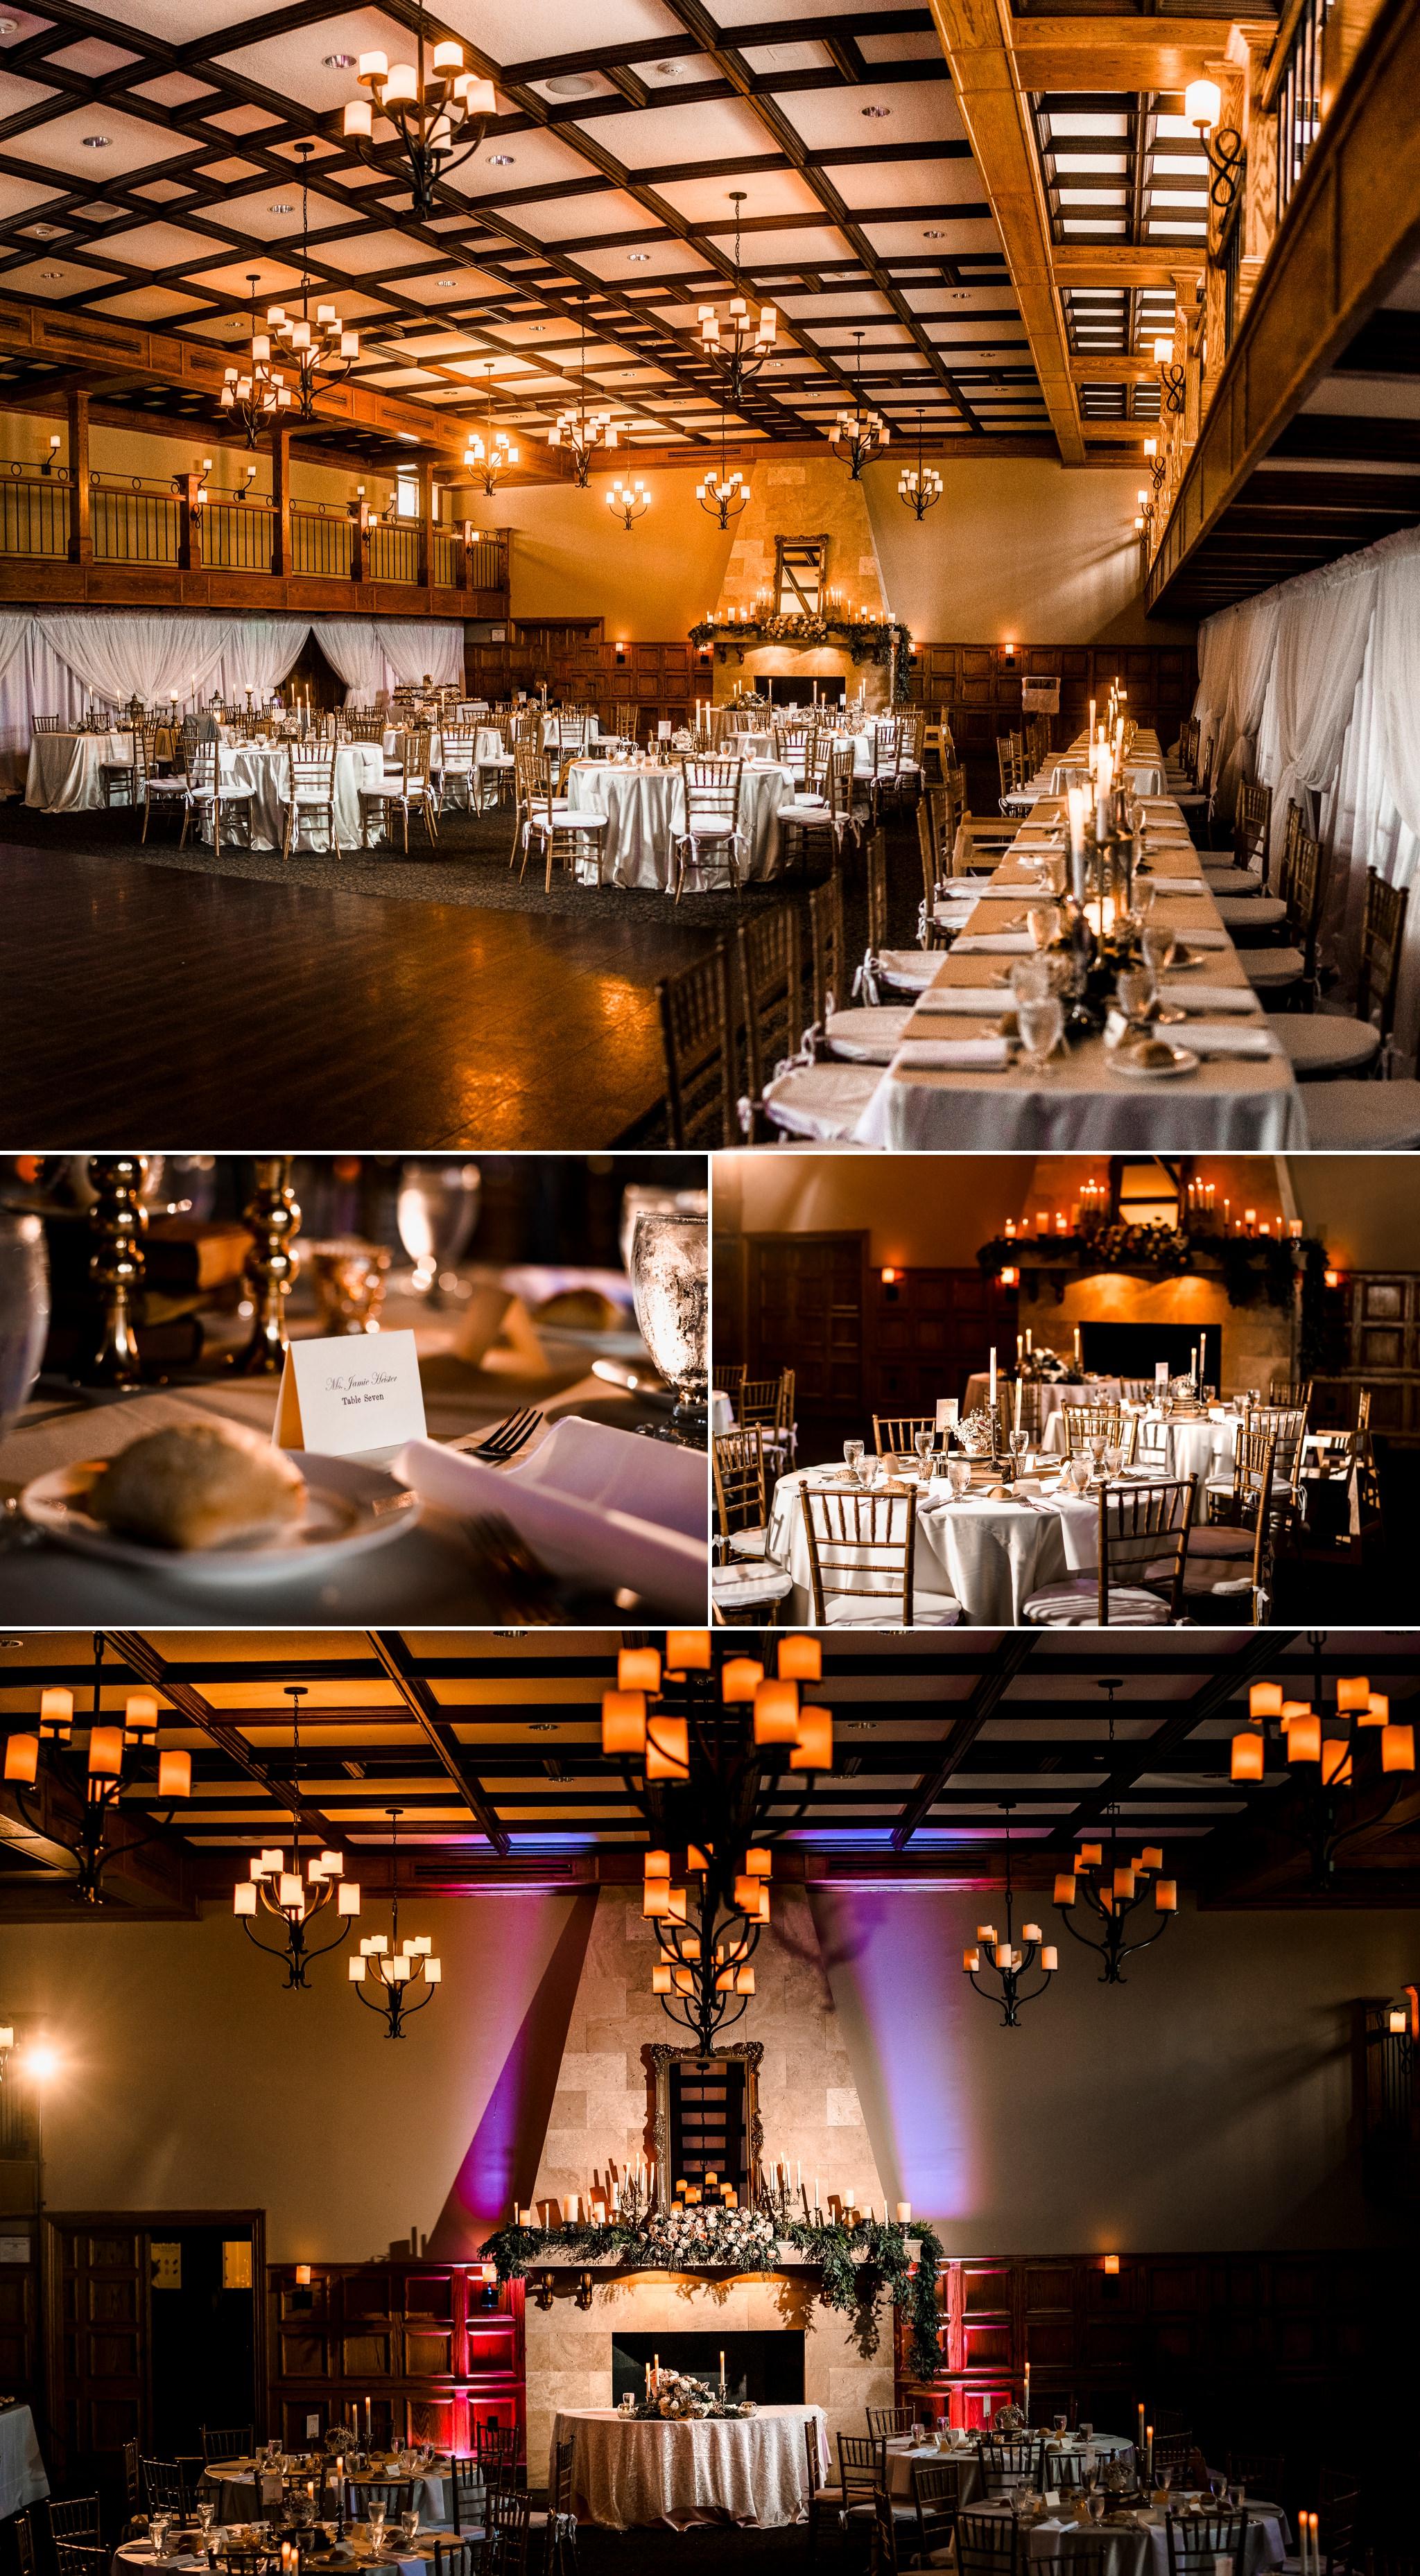 Barbato-Moorestown-Community-House-Wedding-New-Jersey-Photographer-50.JPG